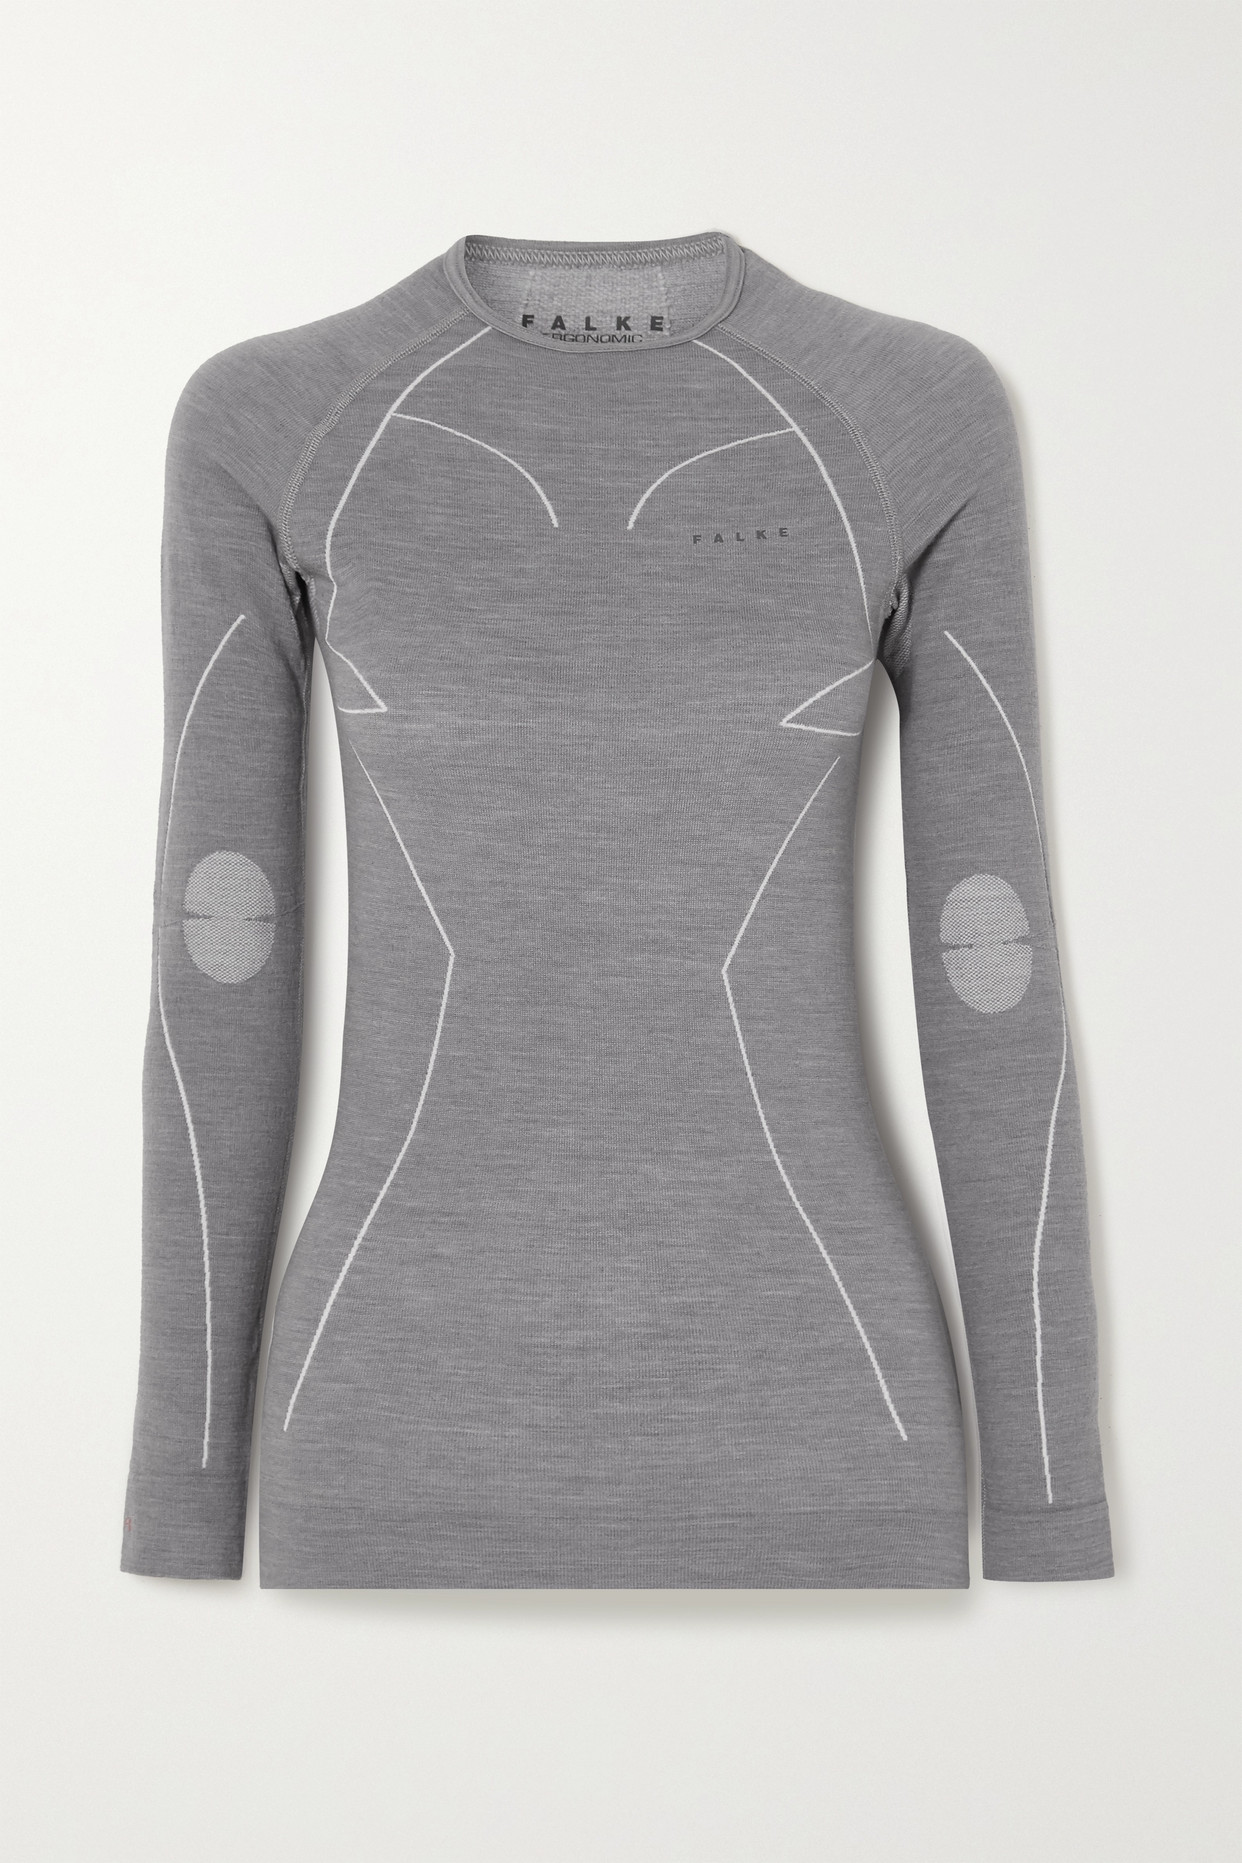 FALKE ERGONOMIC SPORT SYSTEM - 羊毛混纺上衣 - 灰色 - x large